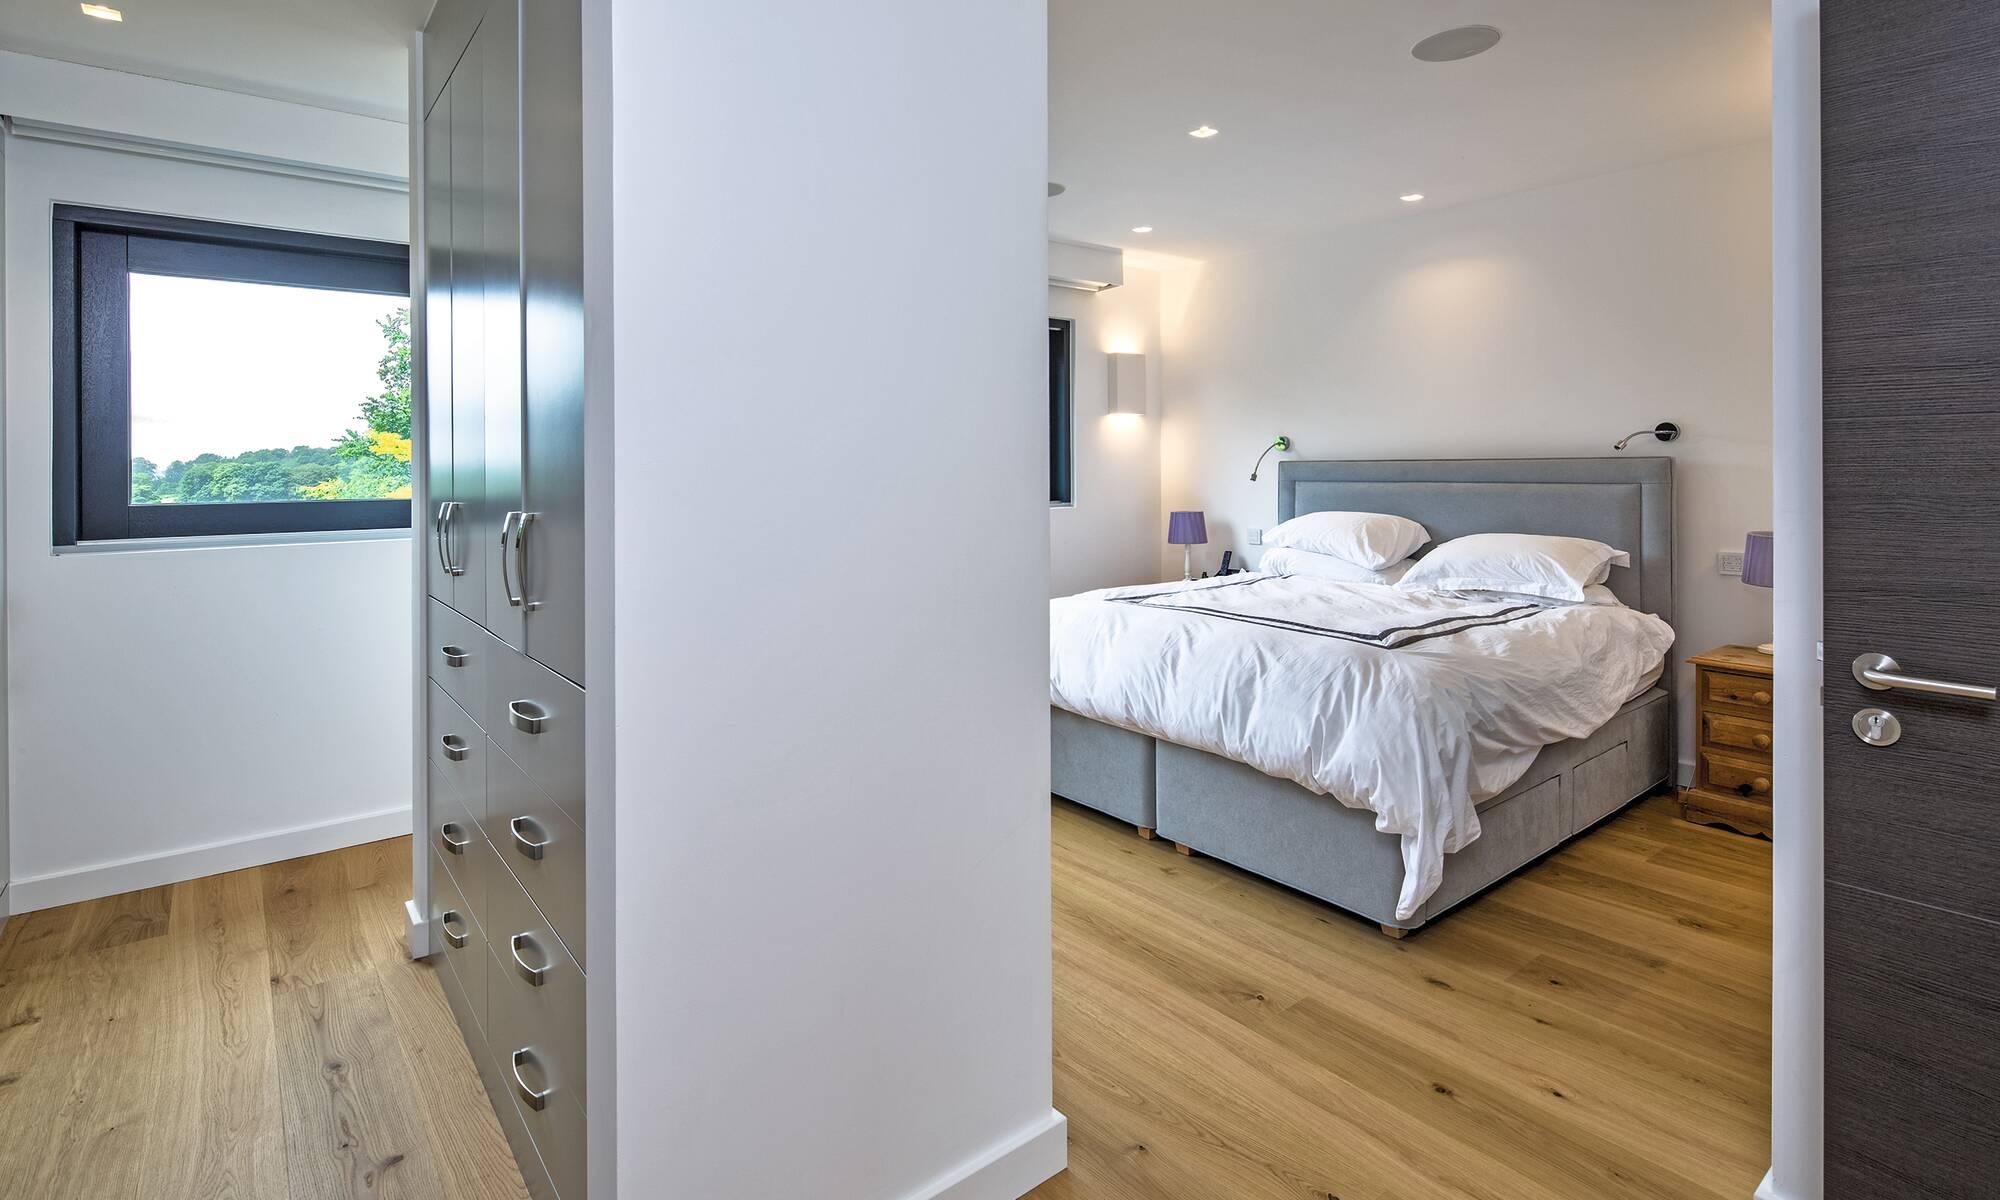 Bespoke, 3-storey prefabricated home